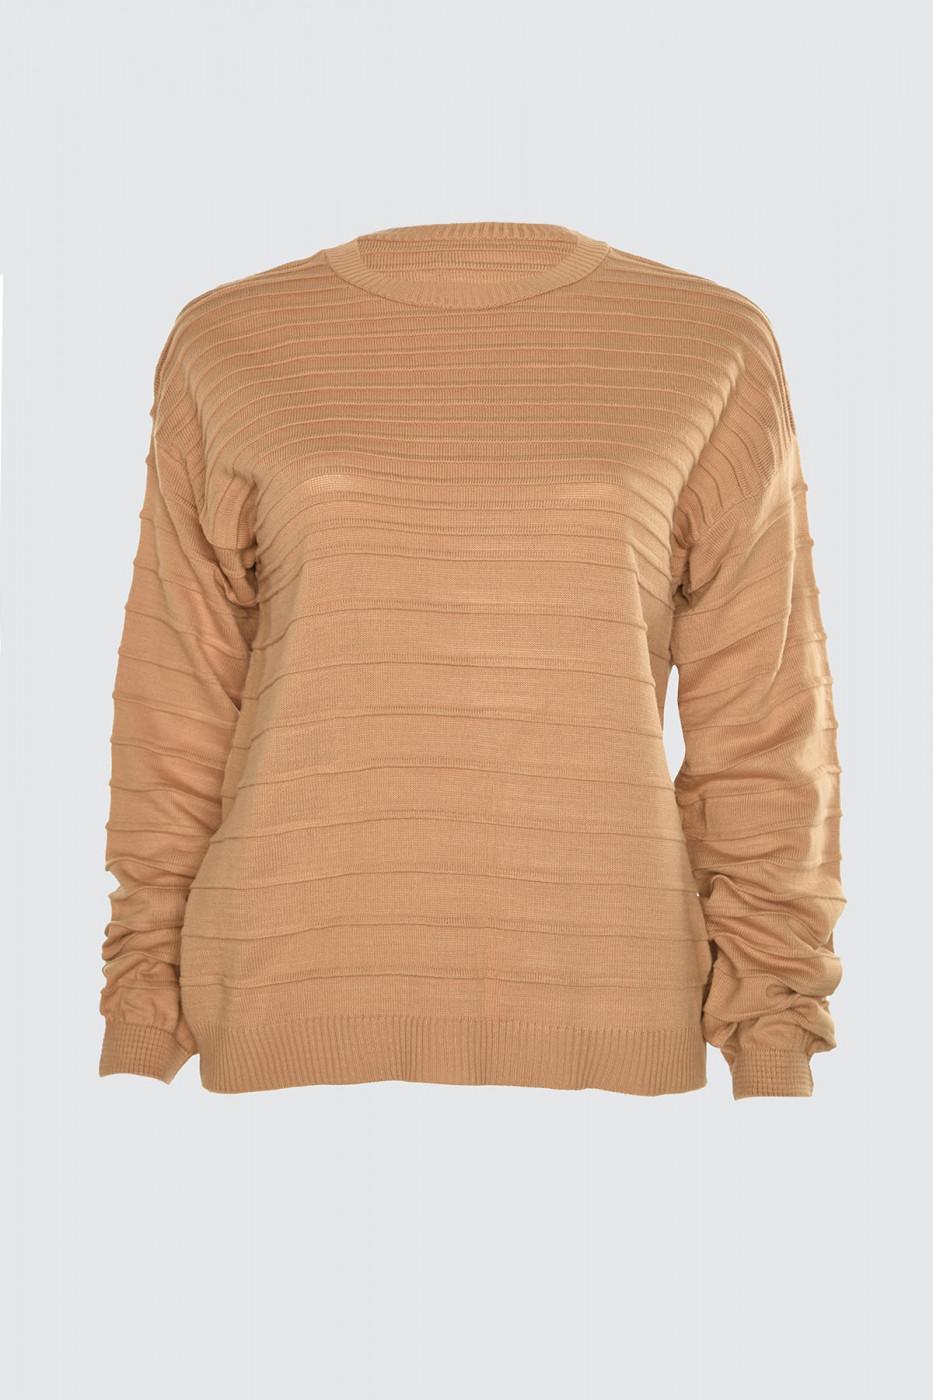 Trendyol Camel Knitted Detailed Knitwear Sweater